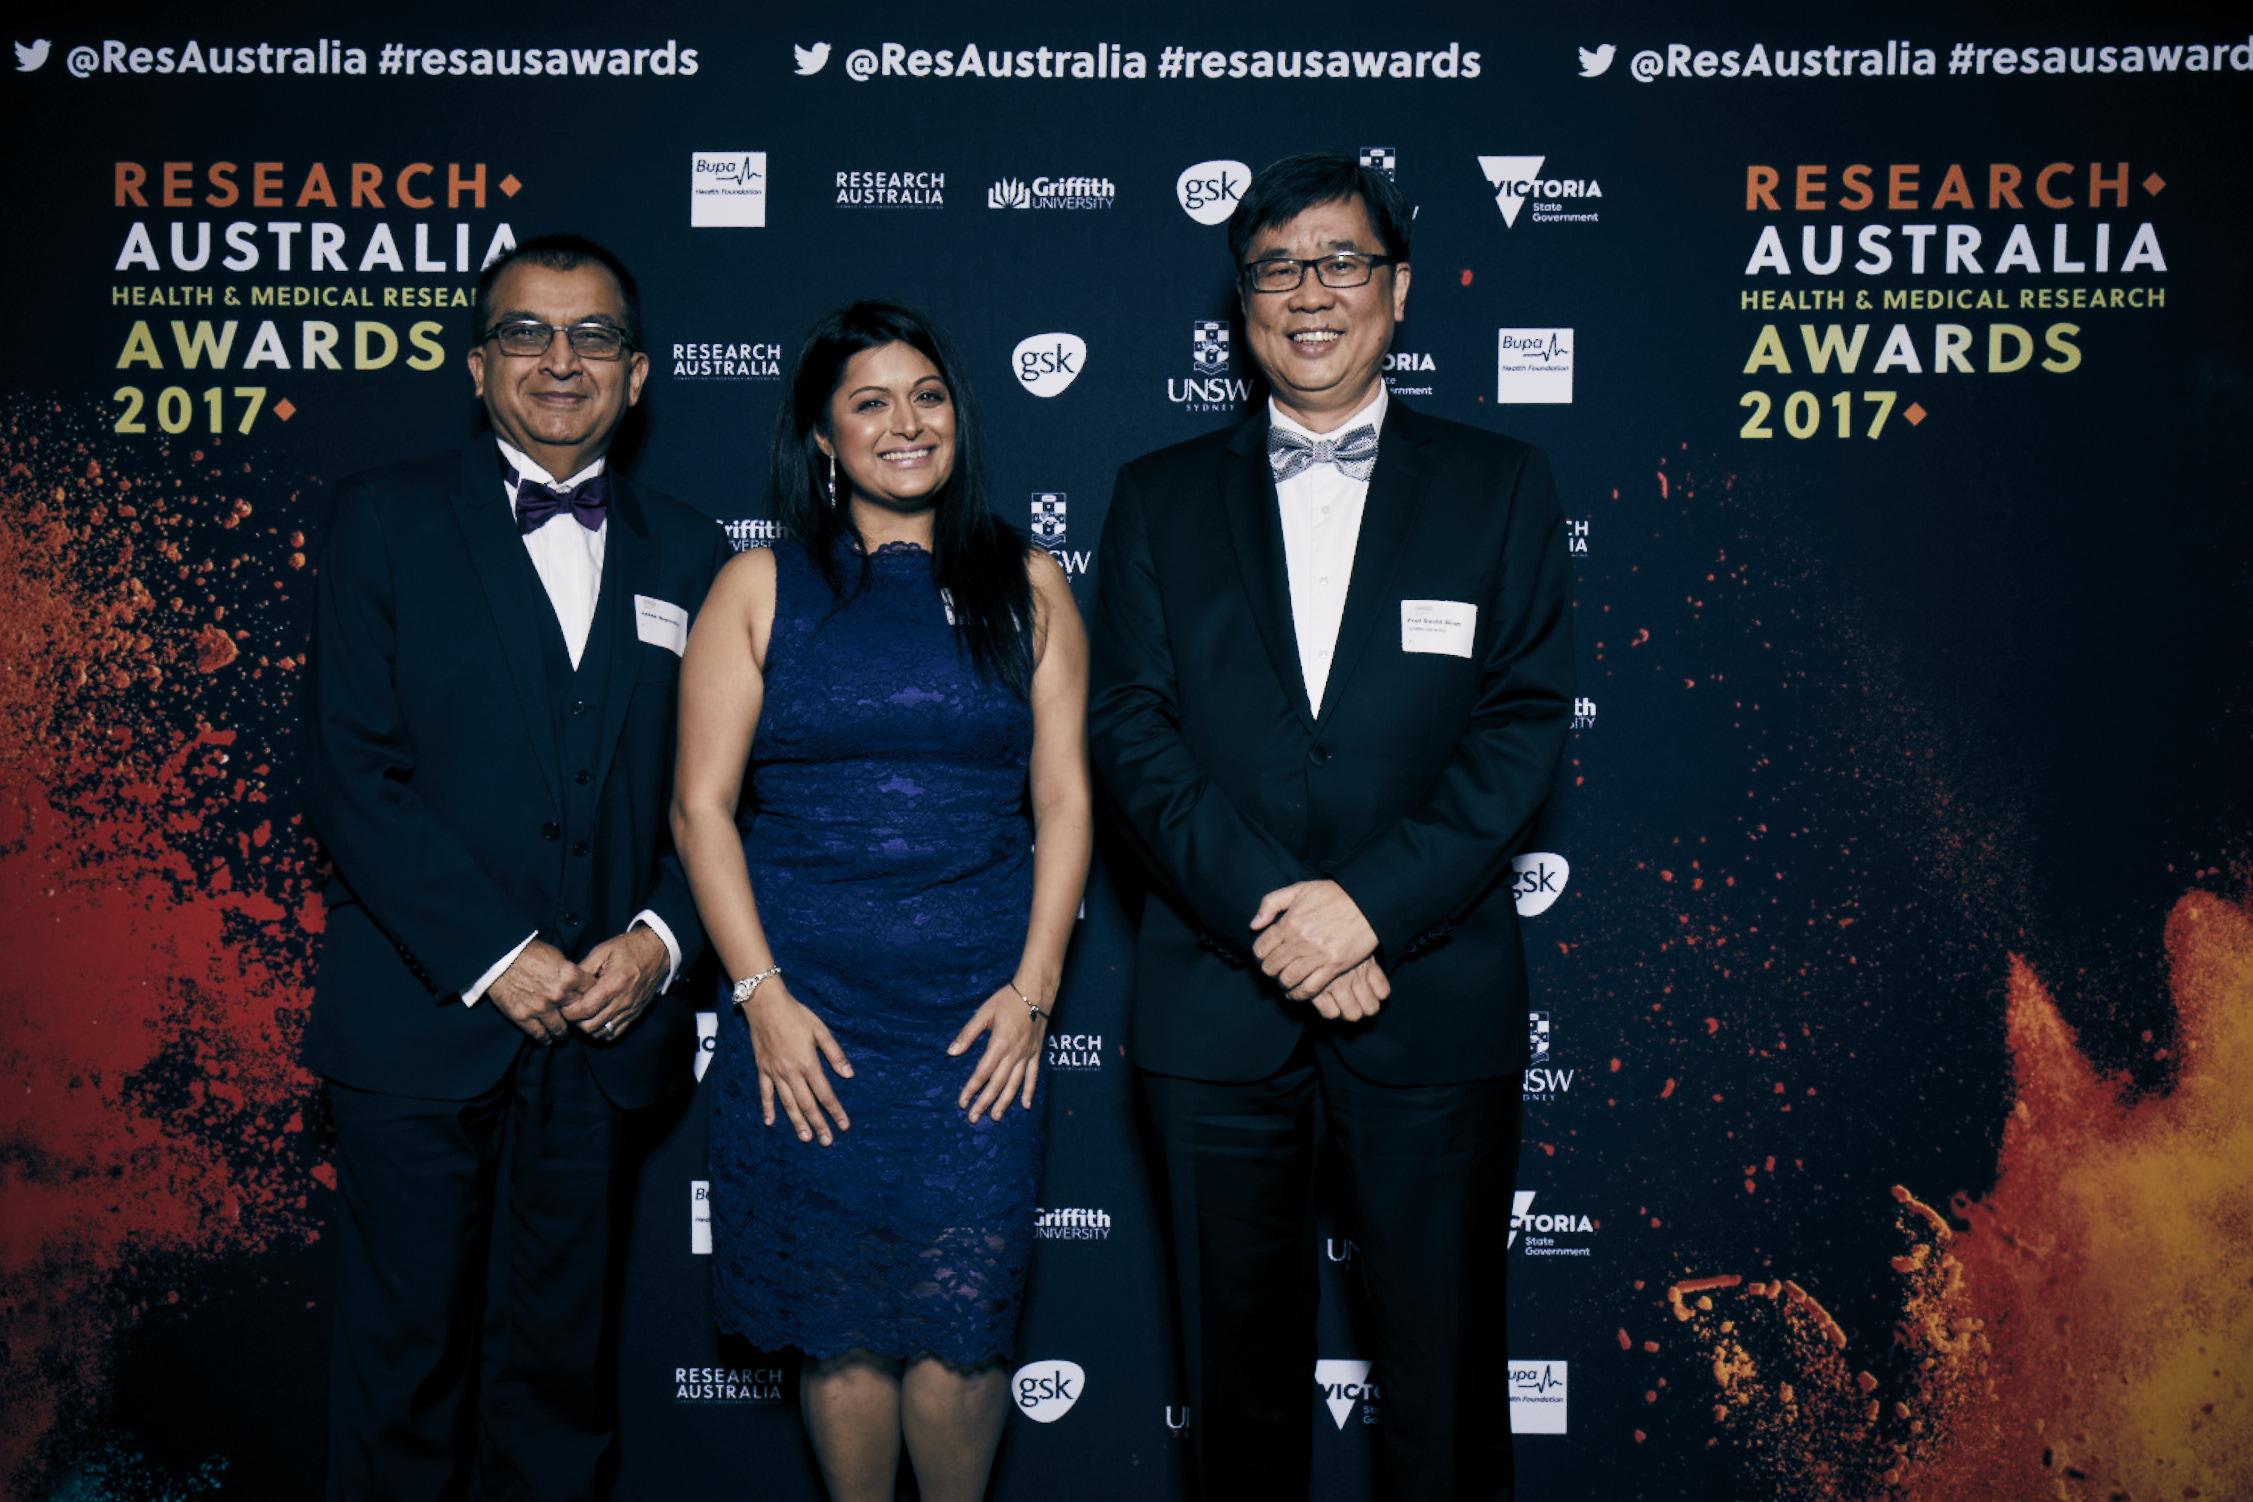 2017 Griffith University Discovery Award Winner: Dr Avnika Ruparelia